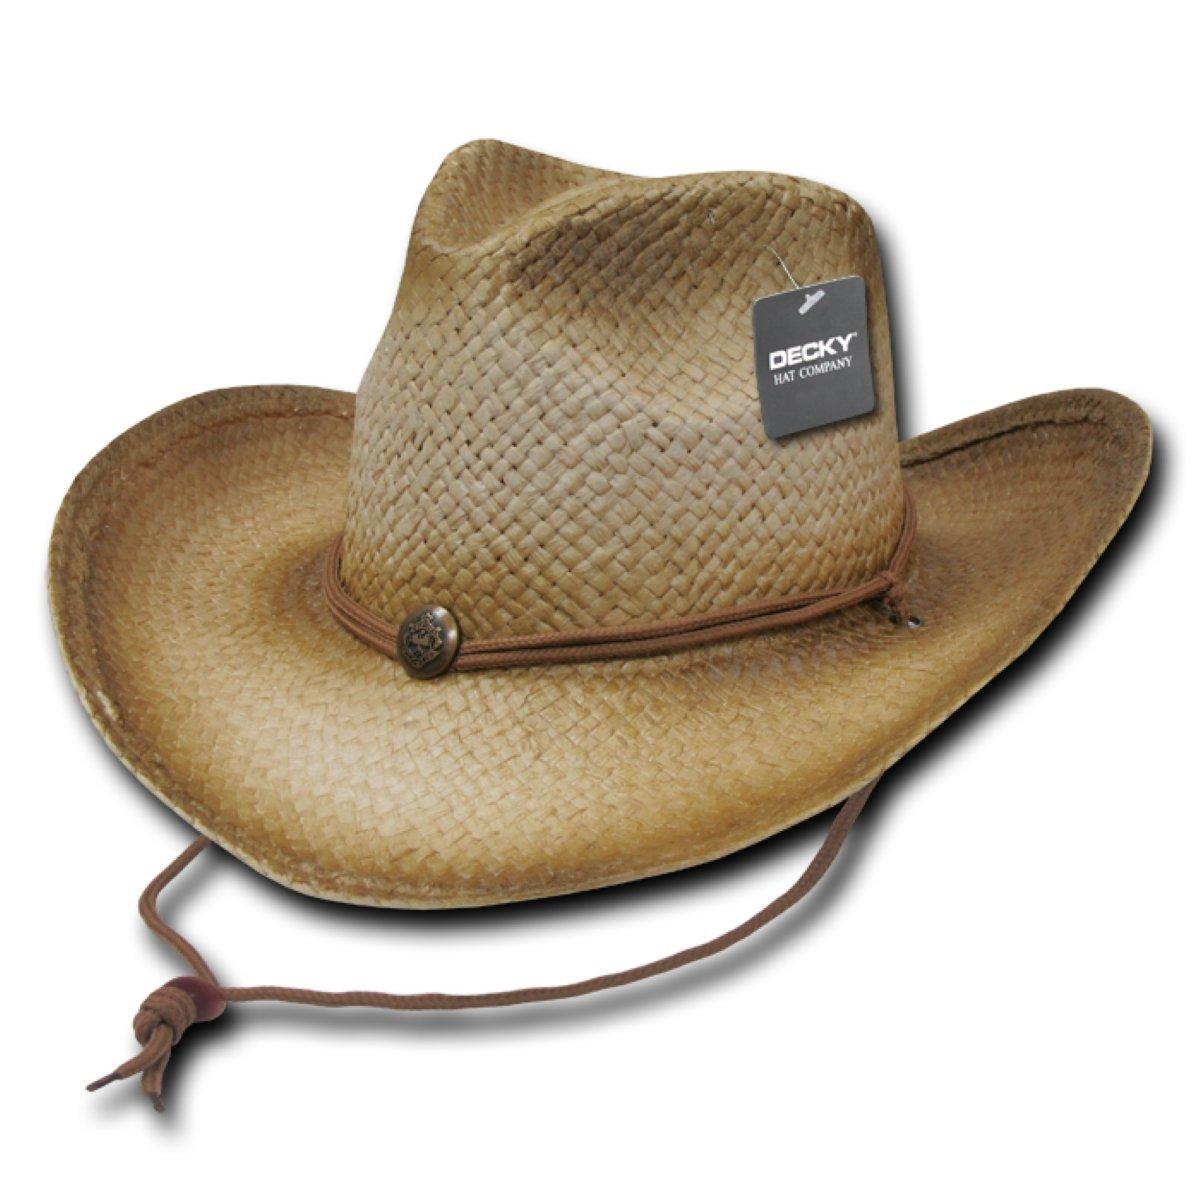 Decky 525-Glazed Paper Straw Cowboy Hat 4340f3b4b80